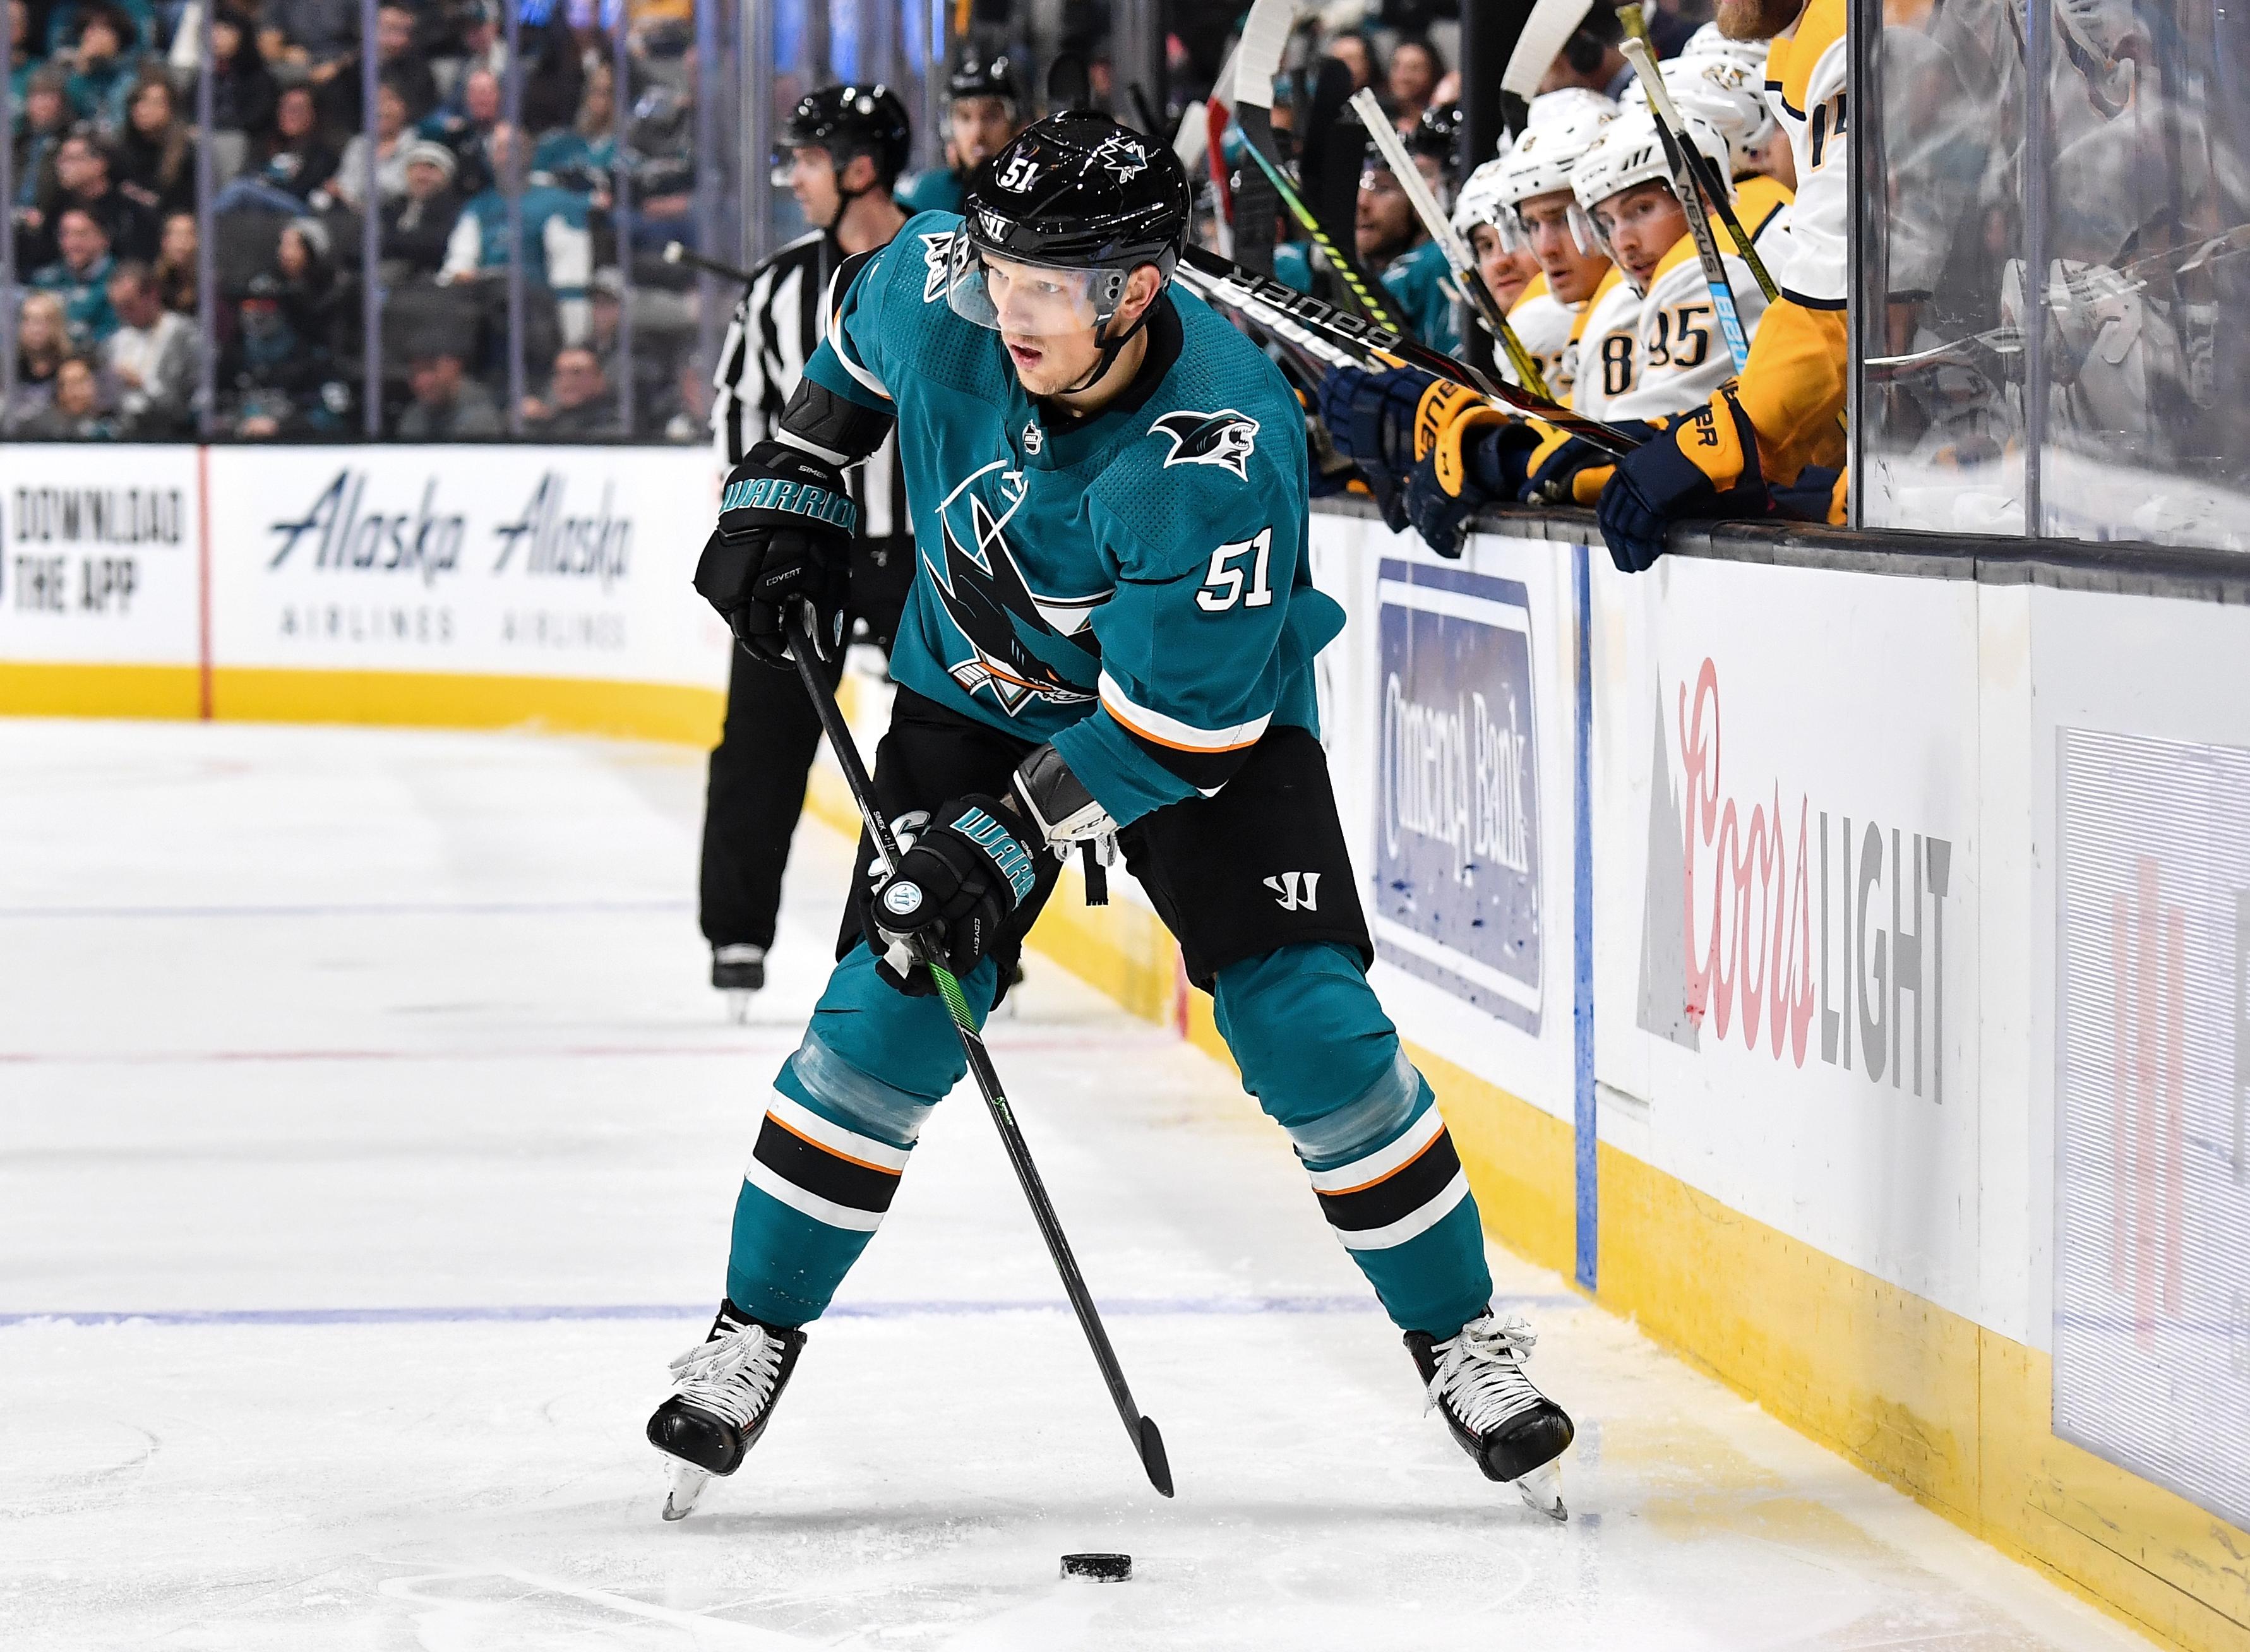 SAN JOSE, CA - NOVEMBER 9: Radim Simek #51 of the San Jose Sharks skates ahead with the puck against the Nashville Predators at SAP Center on November 9, 2019 in San Jose, California.